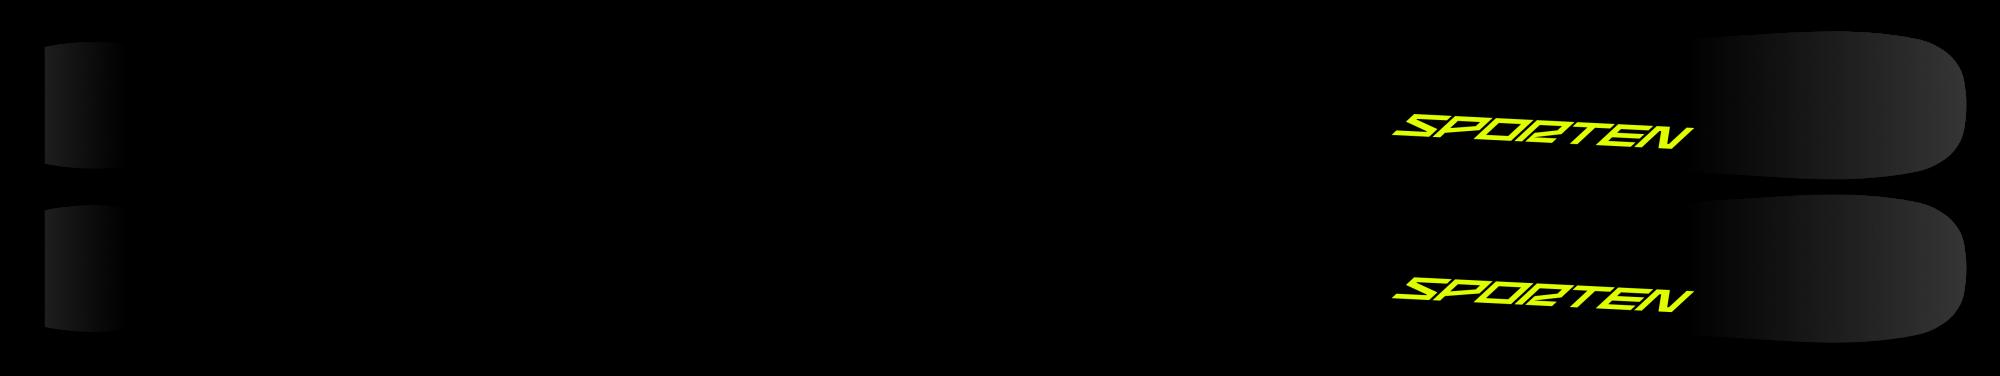 Sporten Iridium 6 2021.pngI.png